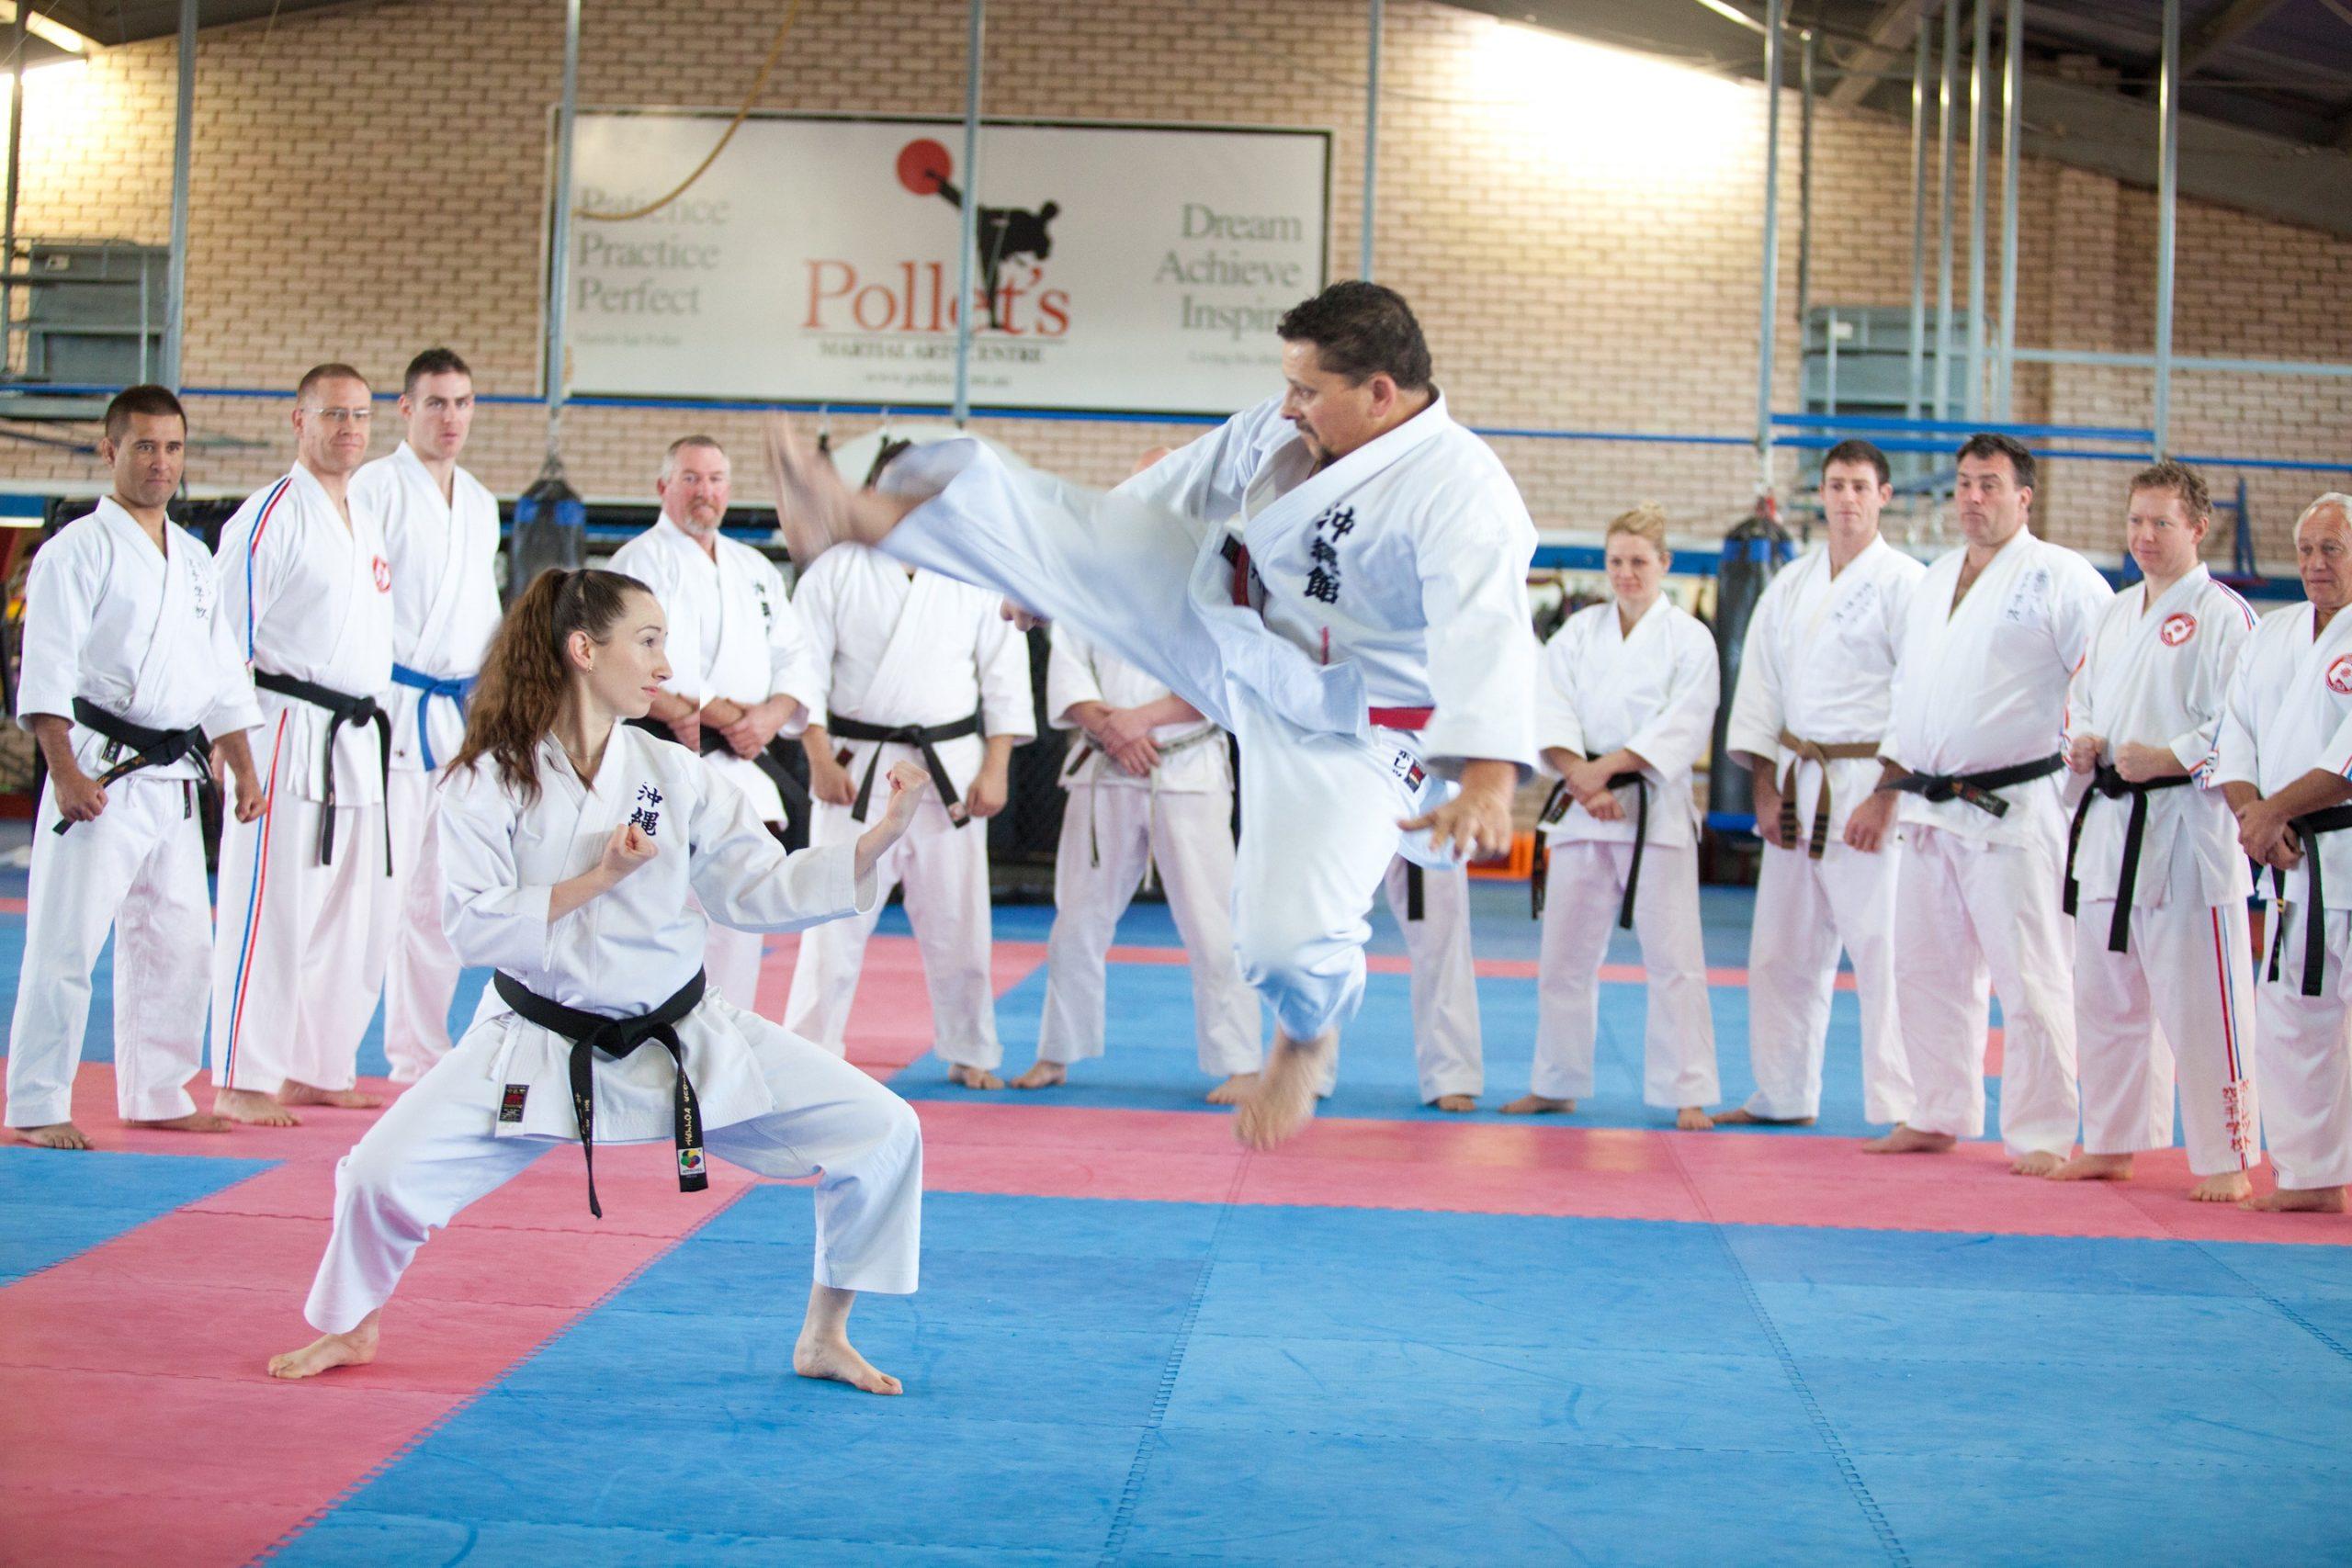 Martial arts, mma, boxing classes, kids karate, karate classes